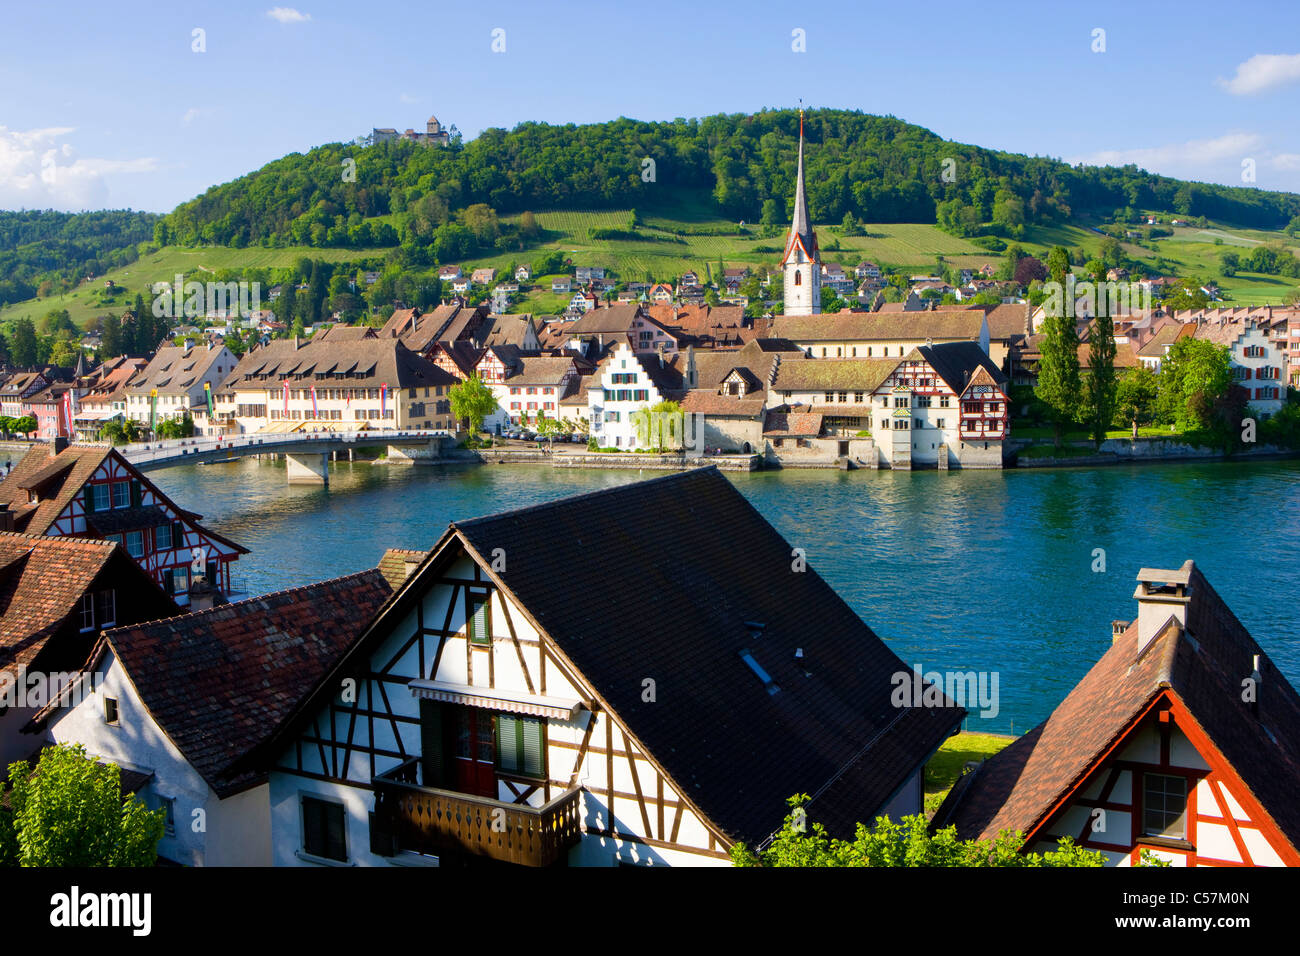 Stein am Rhein, Switzerland, Europe, canton Schaffhausen, provincial town, Old Town, Middle Ages, river, flow, Rhine, - Stock Image